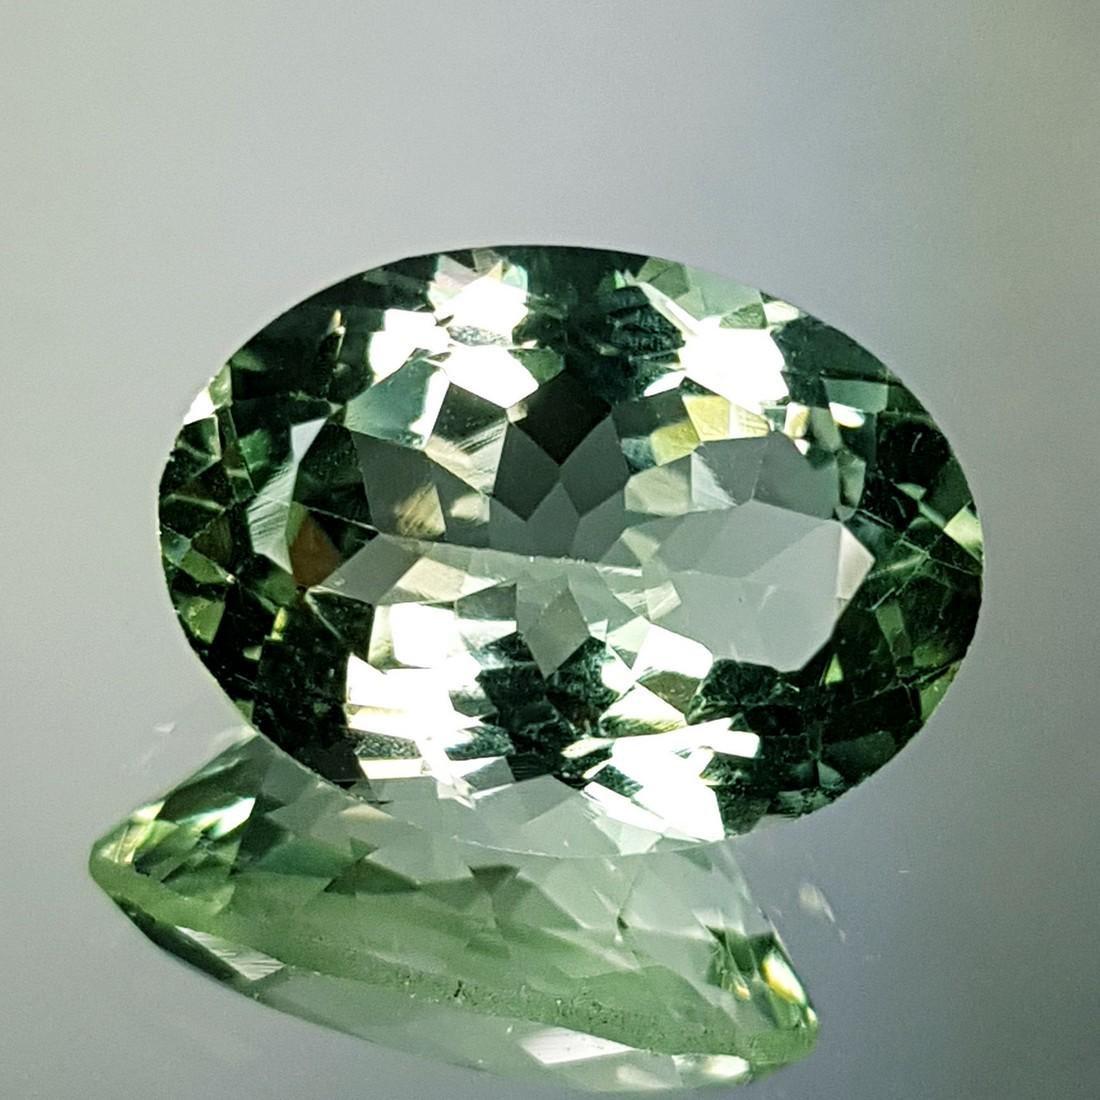 Lovely Gem Natural Green Amethyst - 10.81 ct - 4